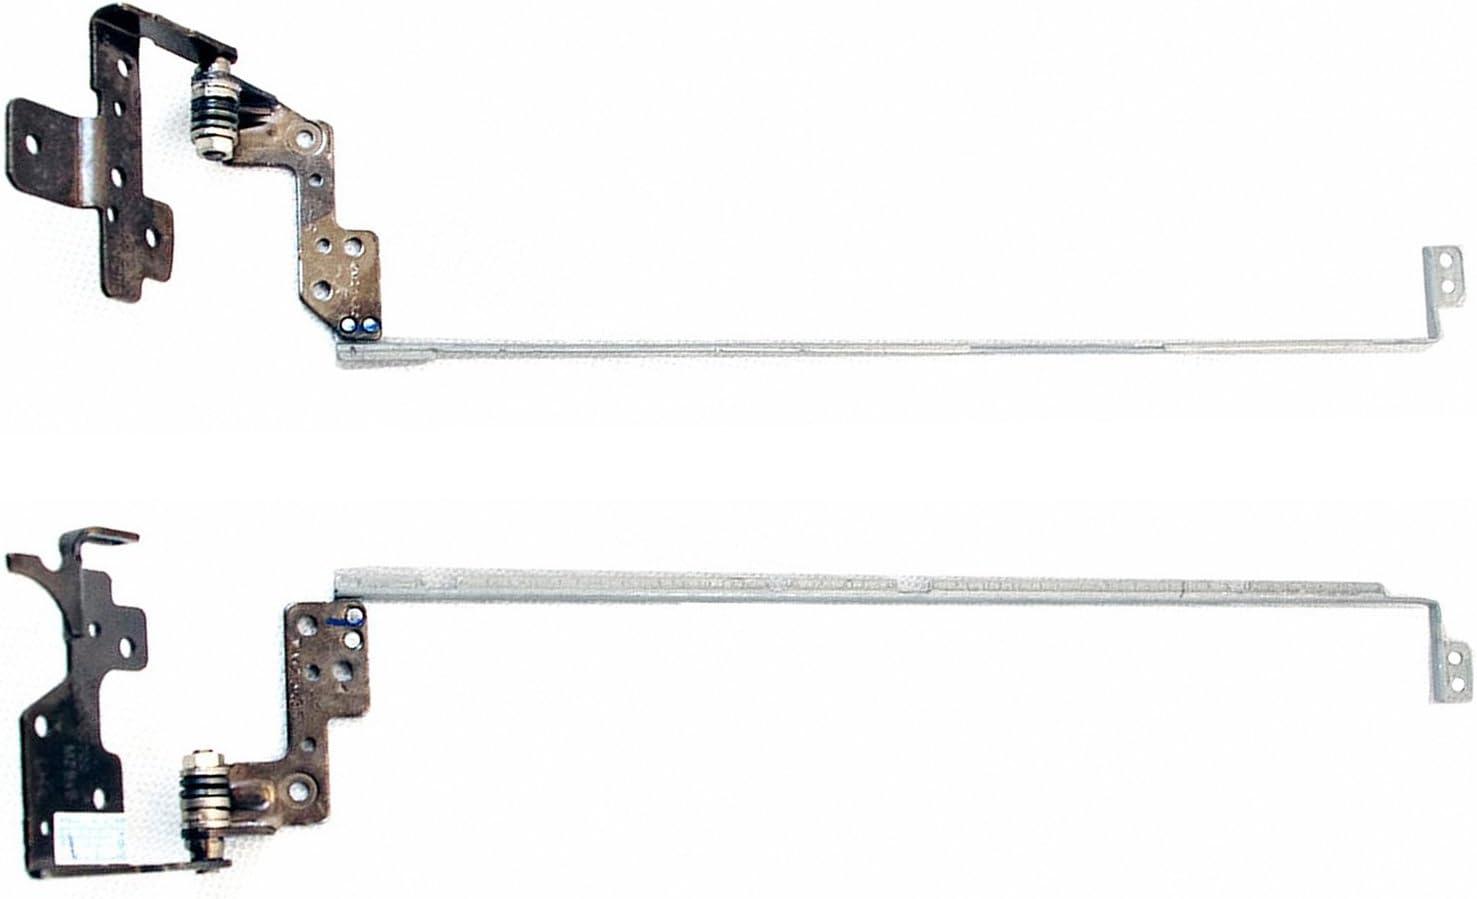 New for HP 15-R005LA 15-R006TU 15-R007TU 15-R007TX series LCD Hinges